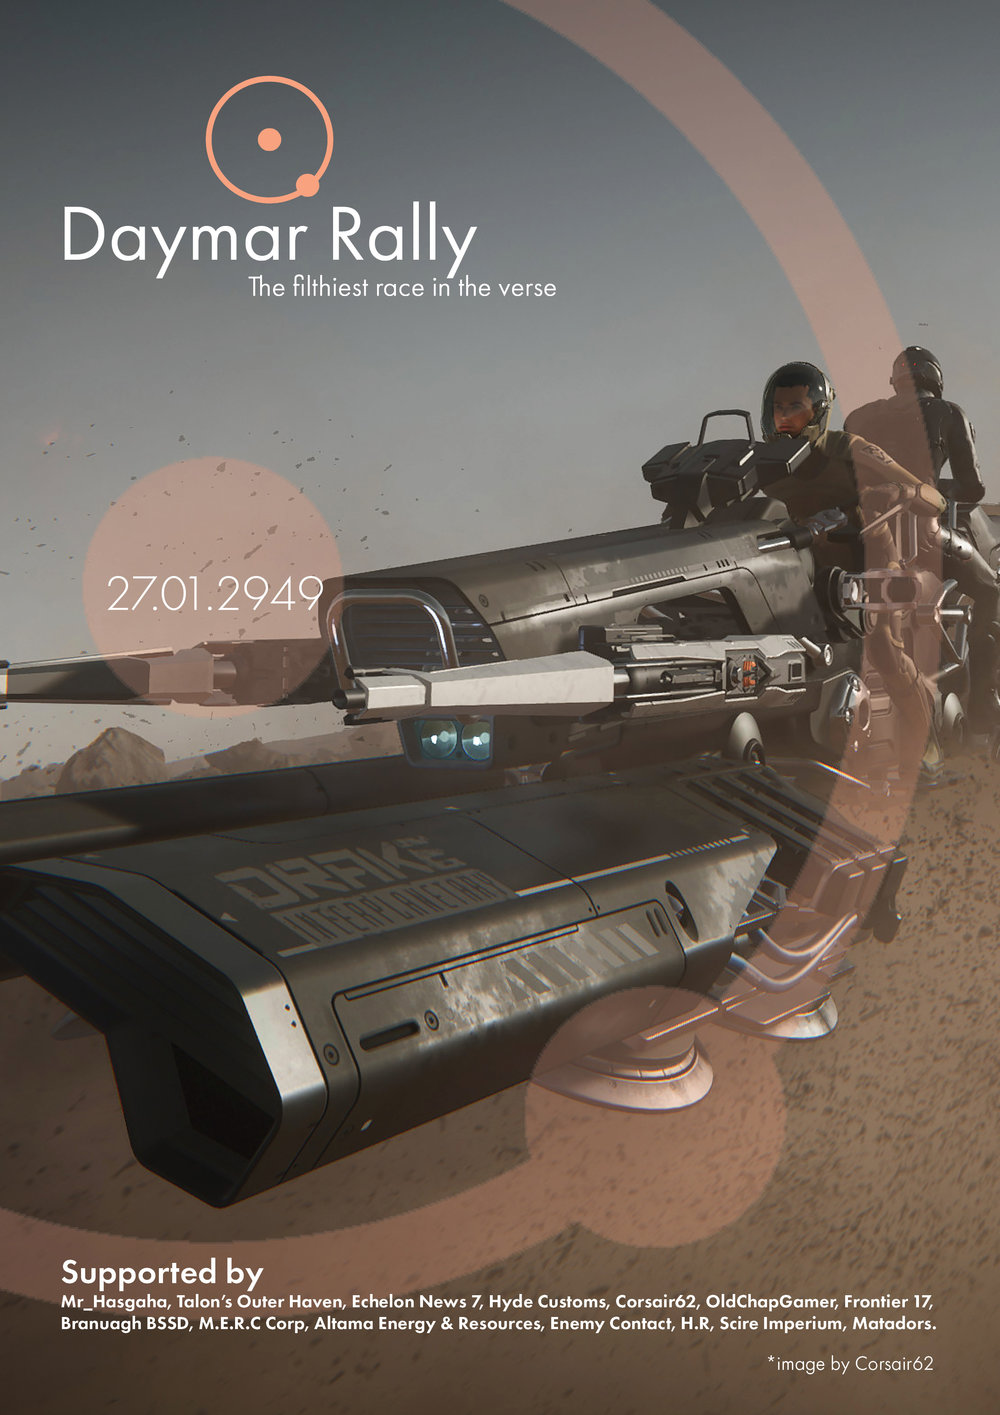 DaymarRally_Poster8.jpg